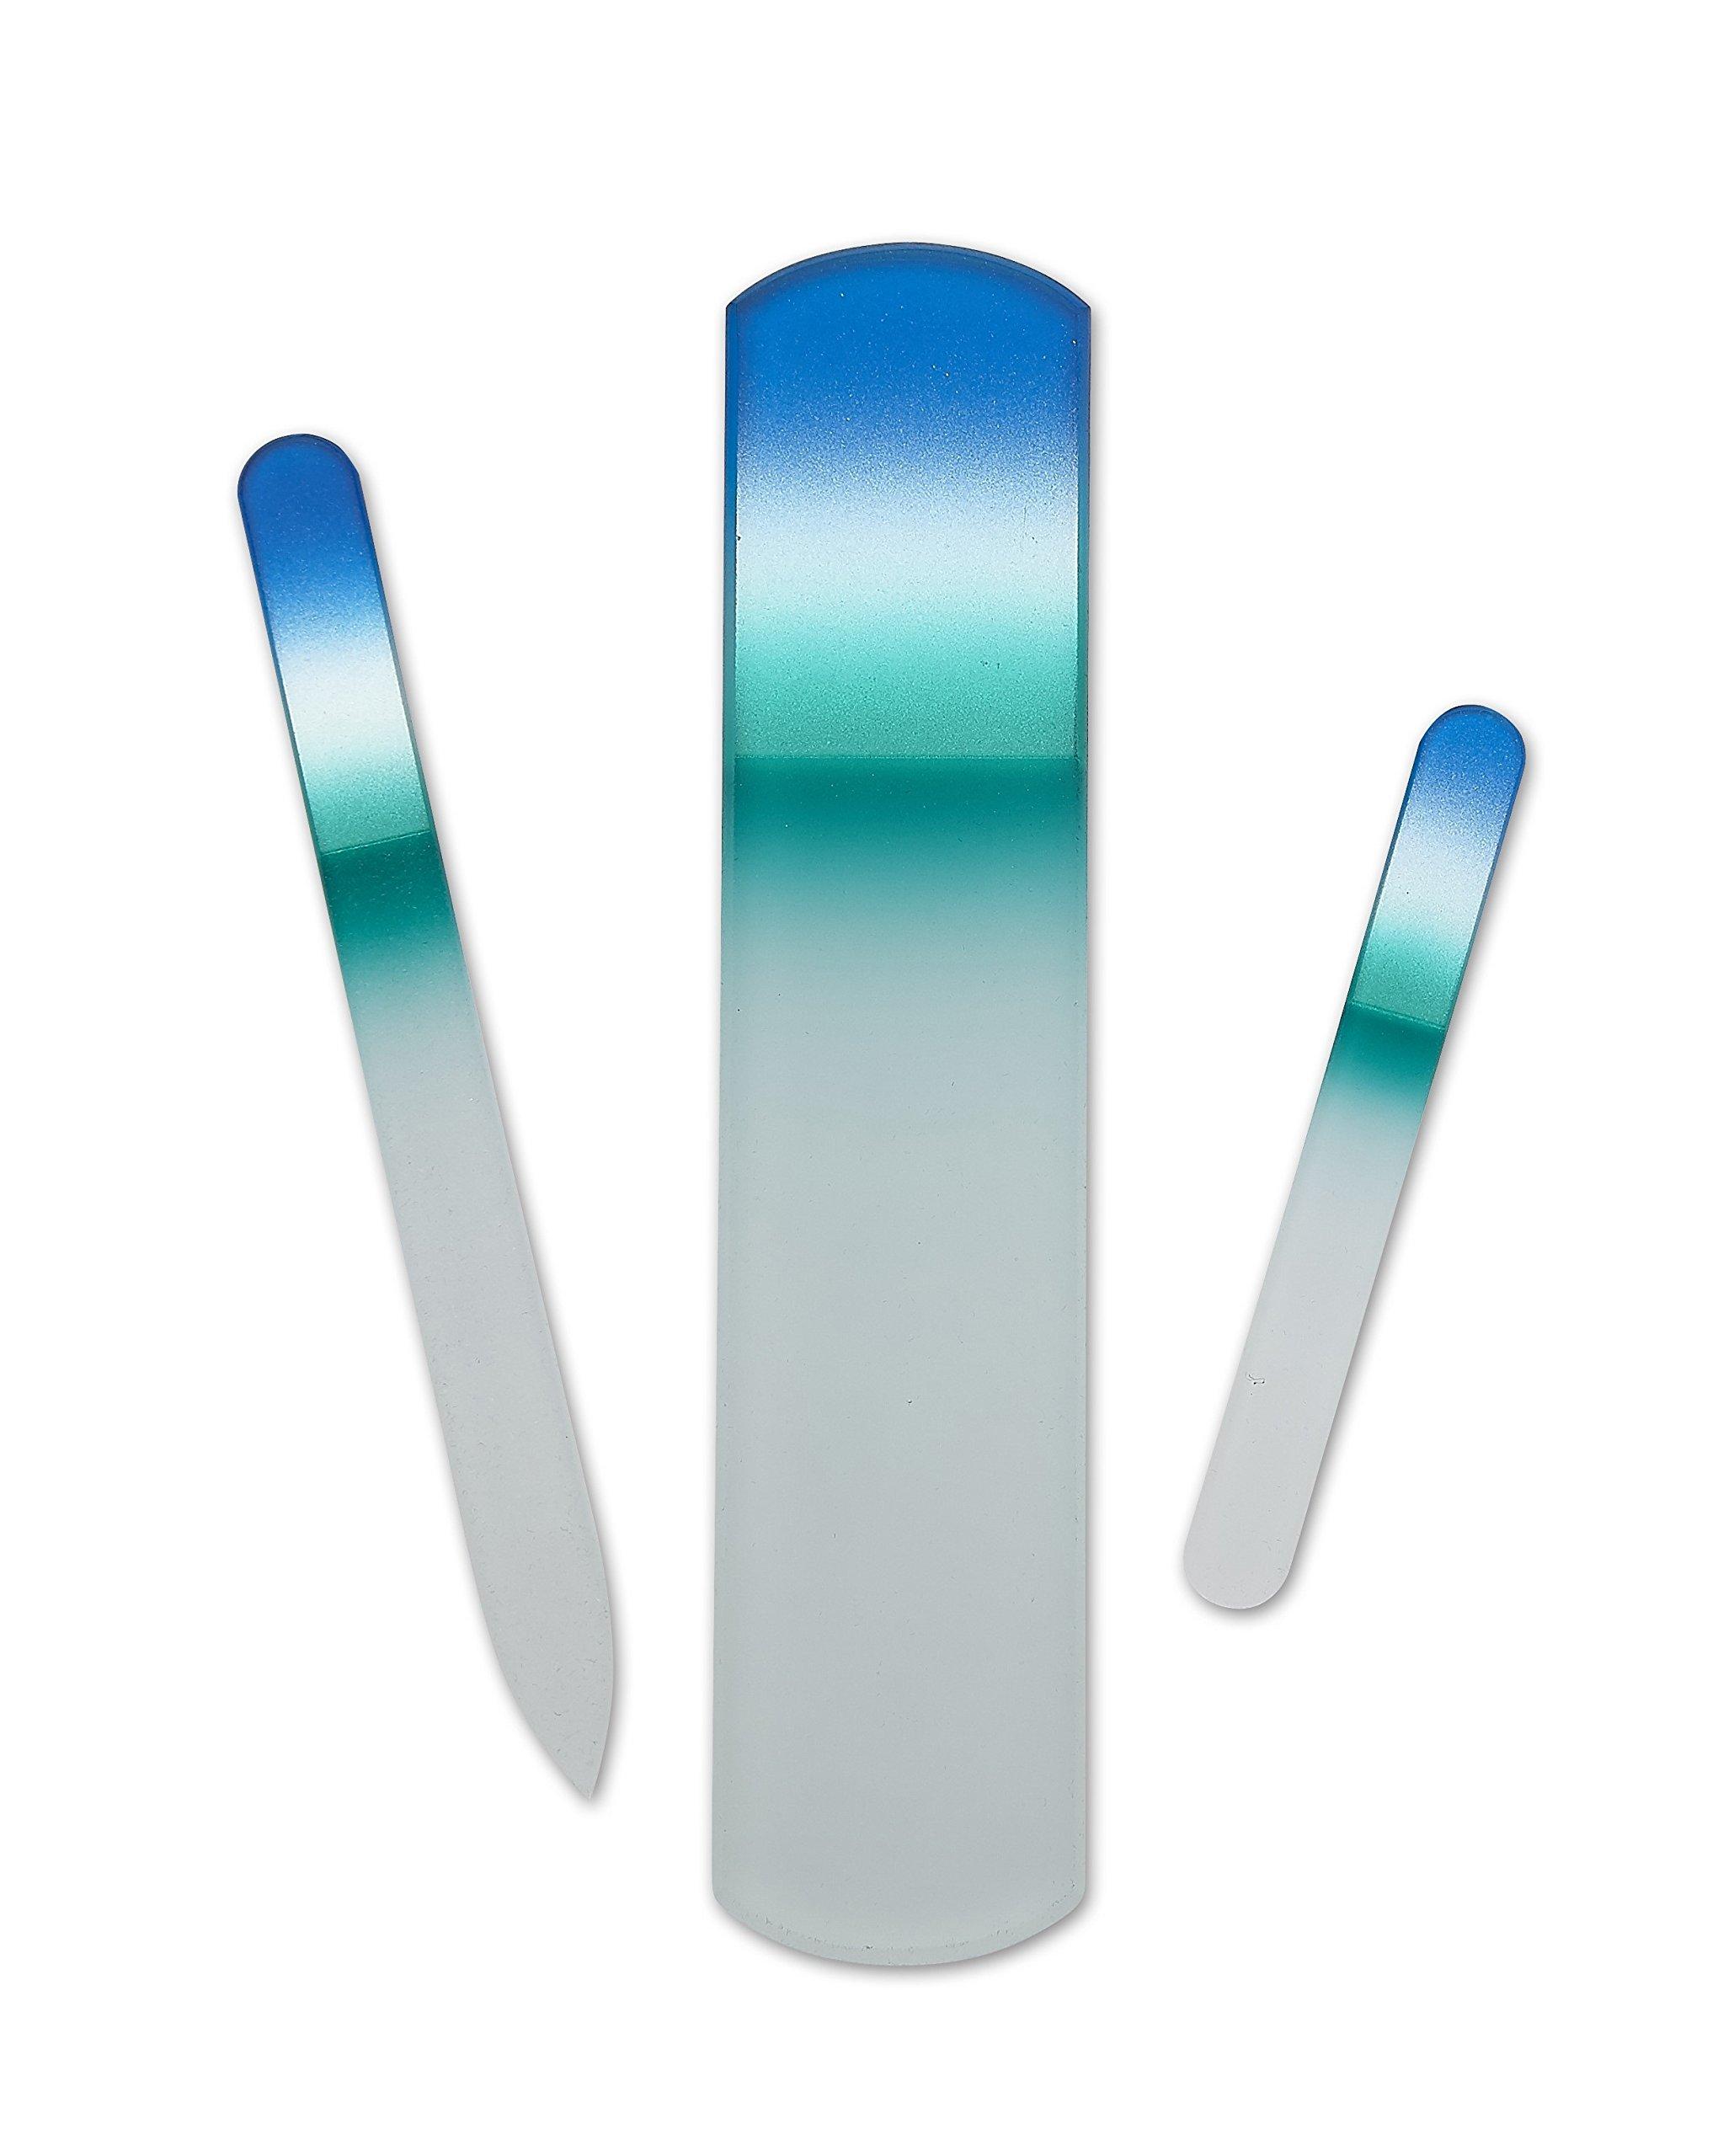 World's Best Tweezers 3-Piece Manicure Pedicure Crystal Nail File Set | Natural & Acrylic Fingernails | Handmade in Czech Republic | Never Wears Out | Metallic Blue